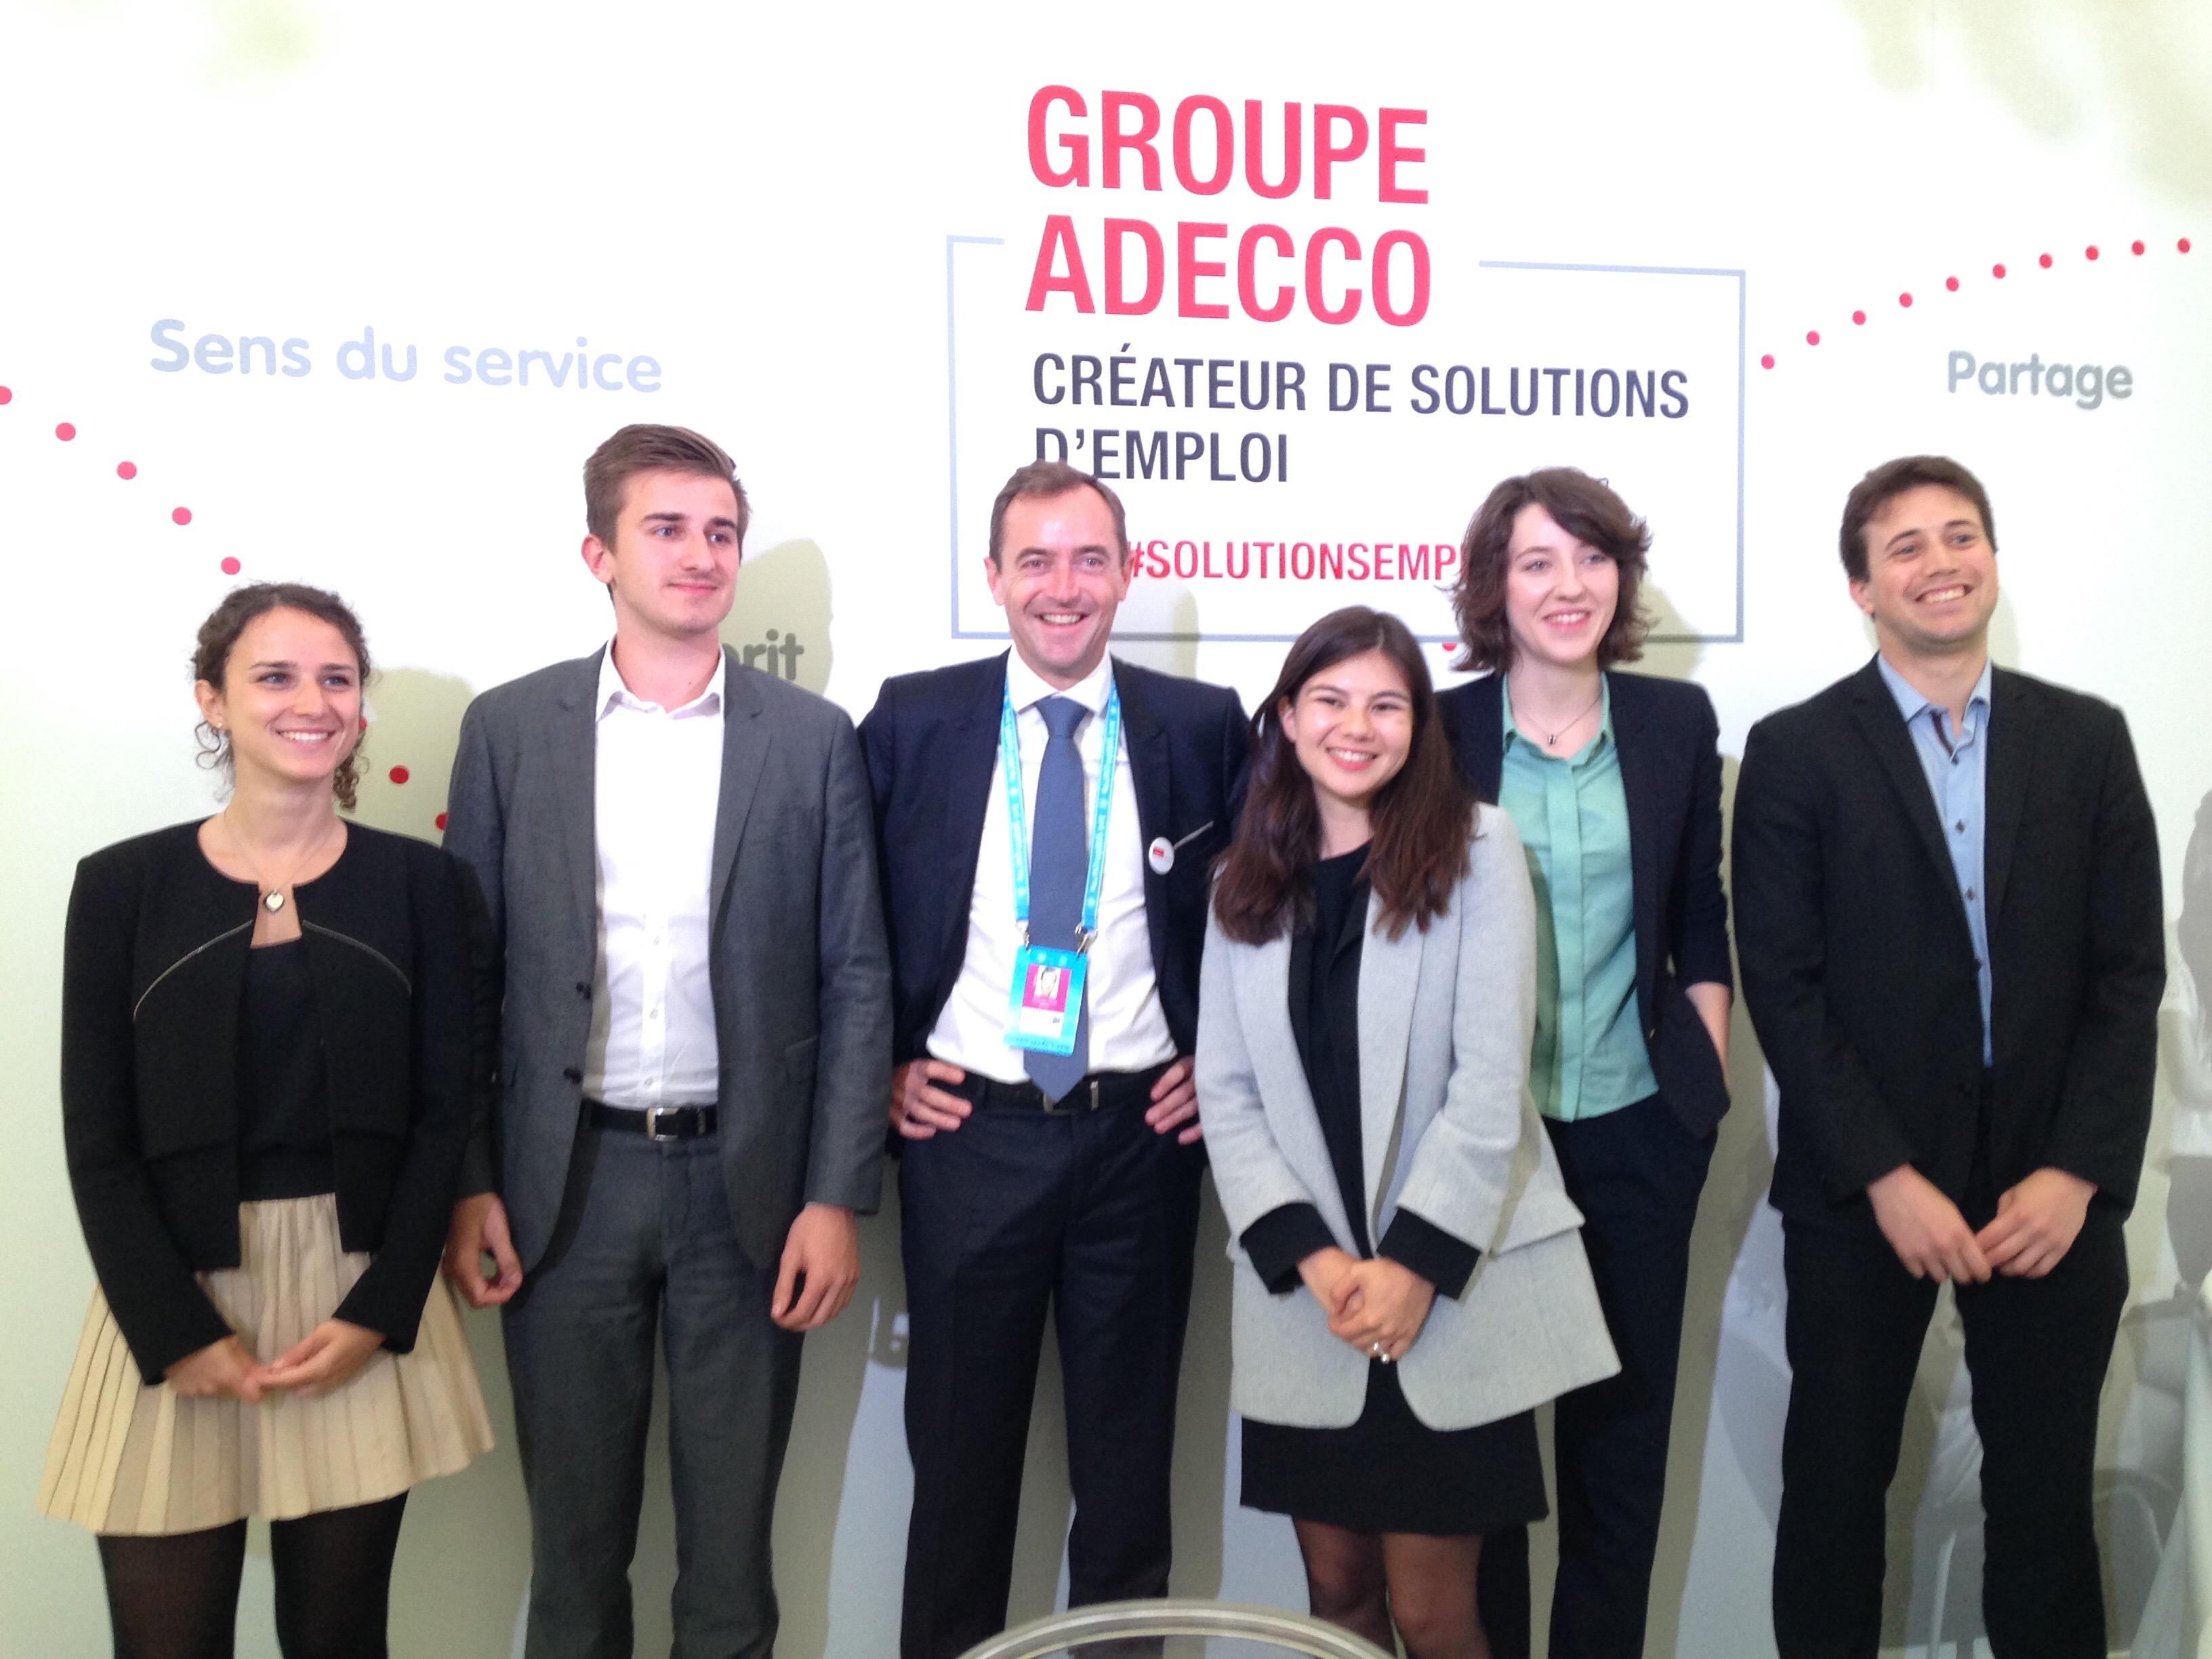 #1Job2Boss 2016 Adecco France, les 5 finalistes avec le PDG C. Catoir.